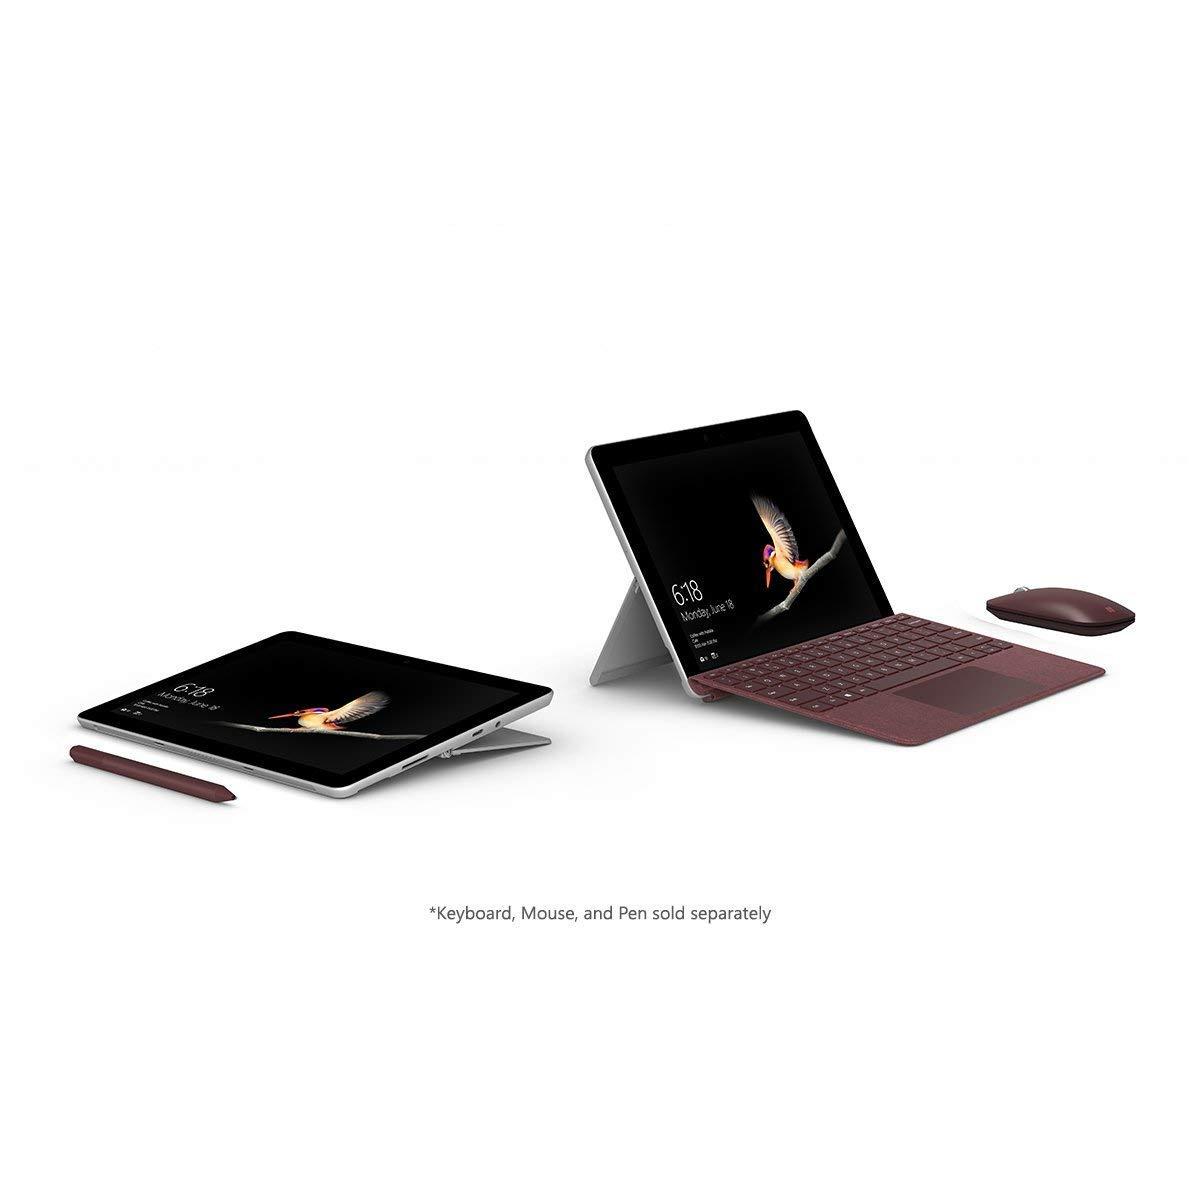 New Microsoft Surface Go (Intel Pentium Gold, 4GB RAM, 64GB) by Microsoft (Image #4)